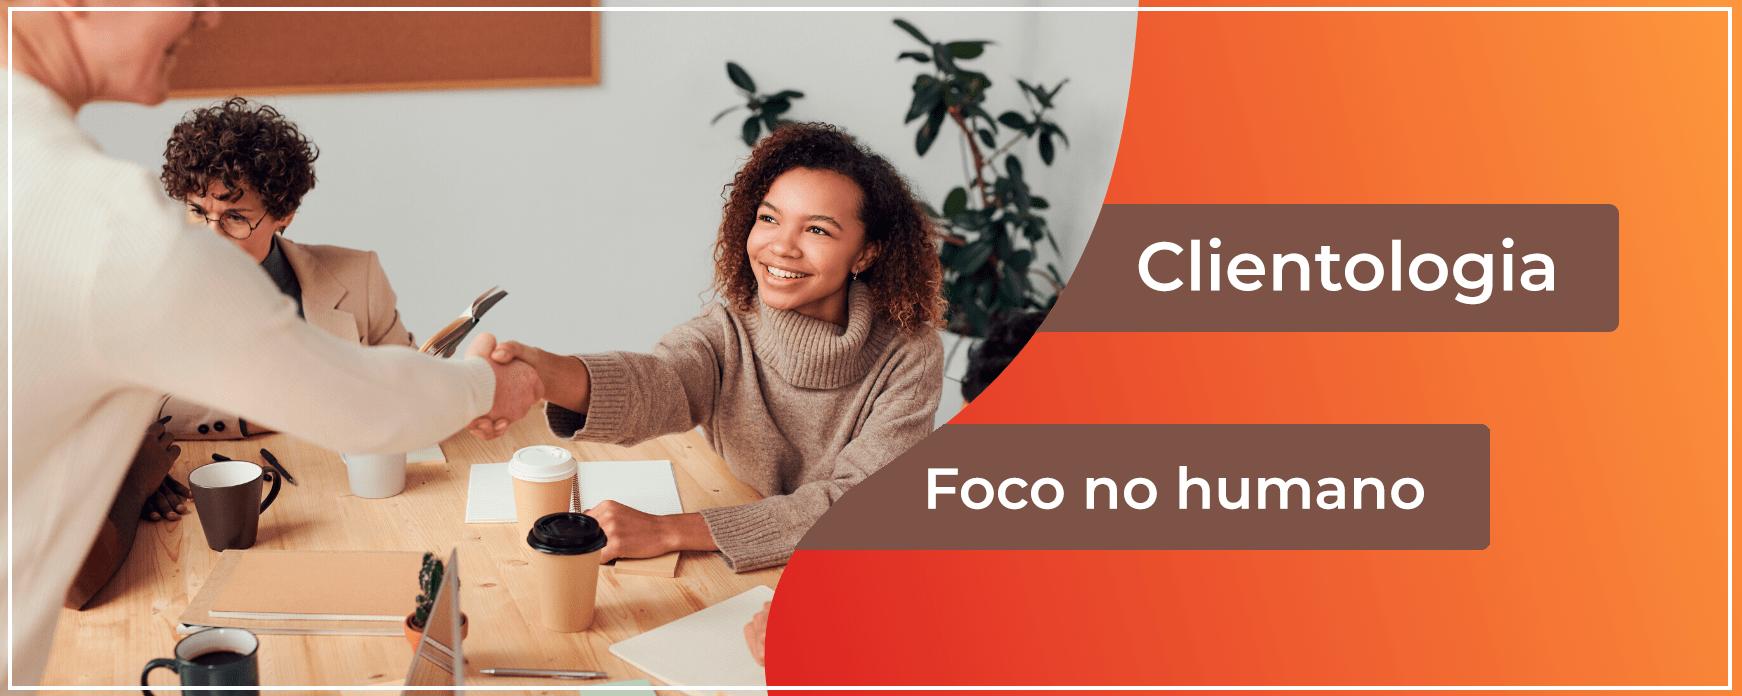 clientologia: como encantar os clientes de verdade